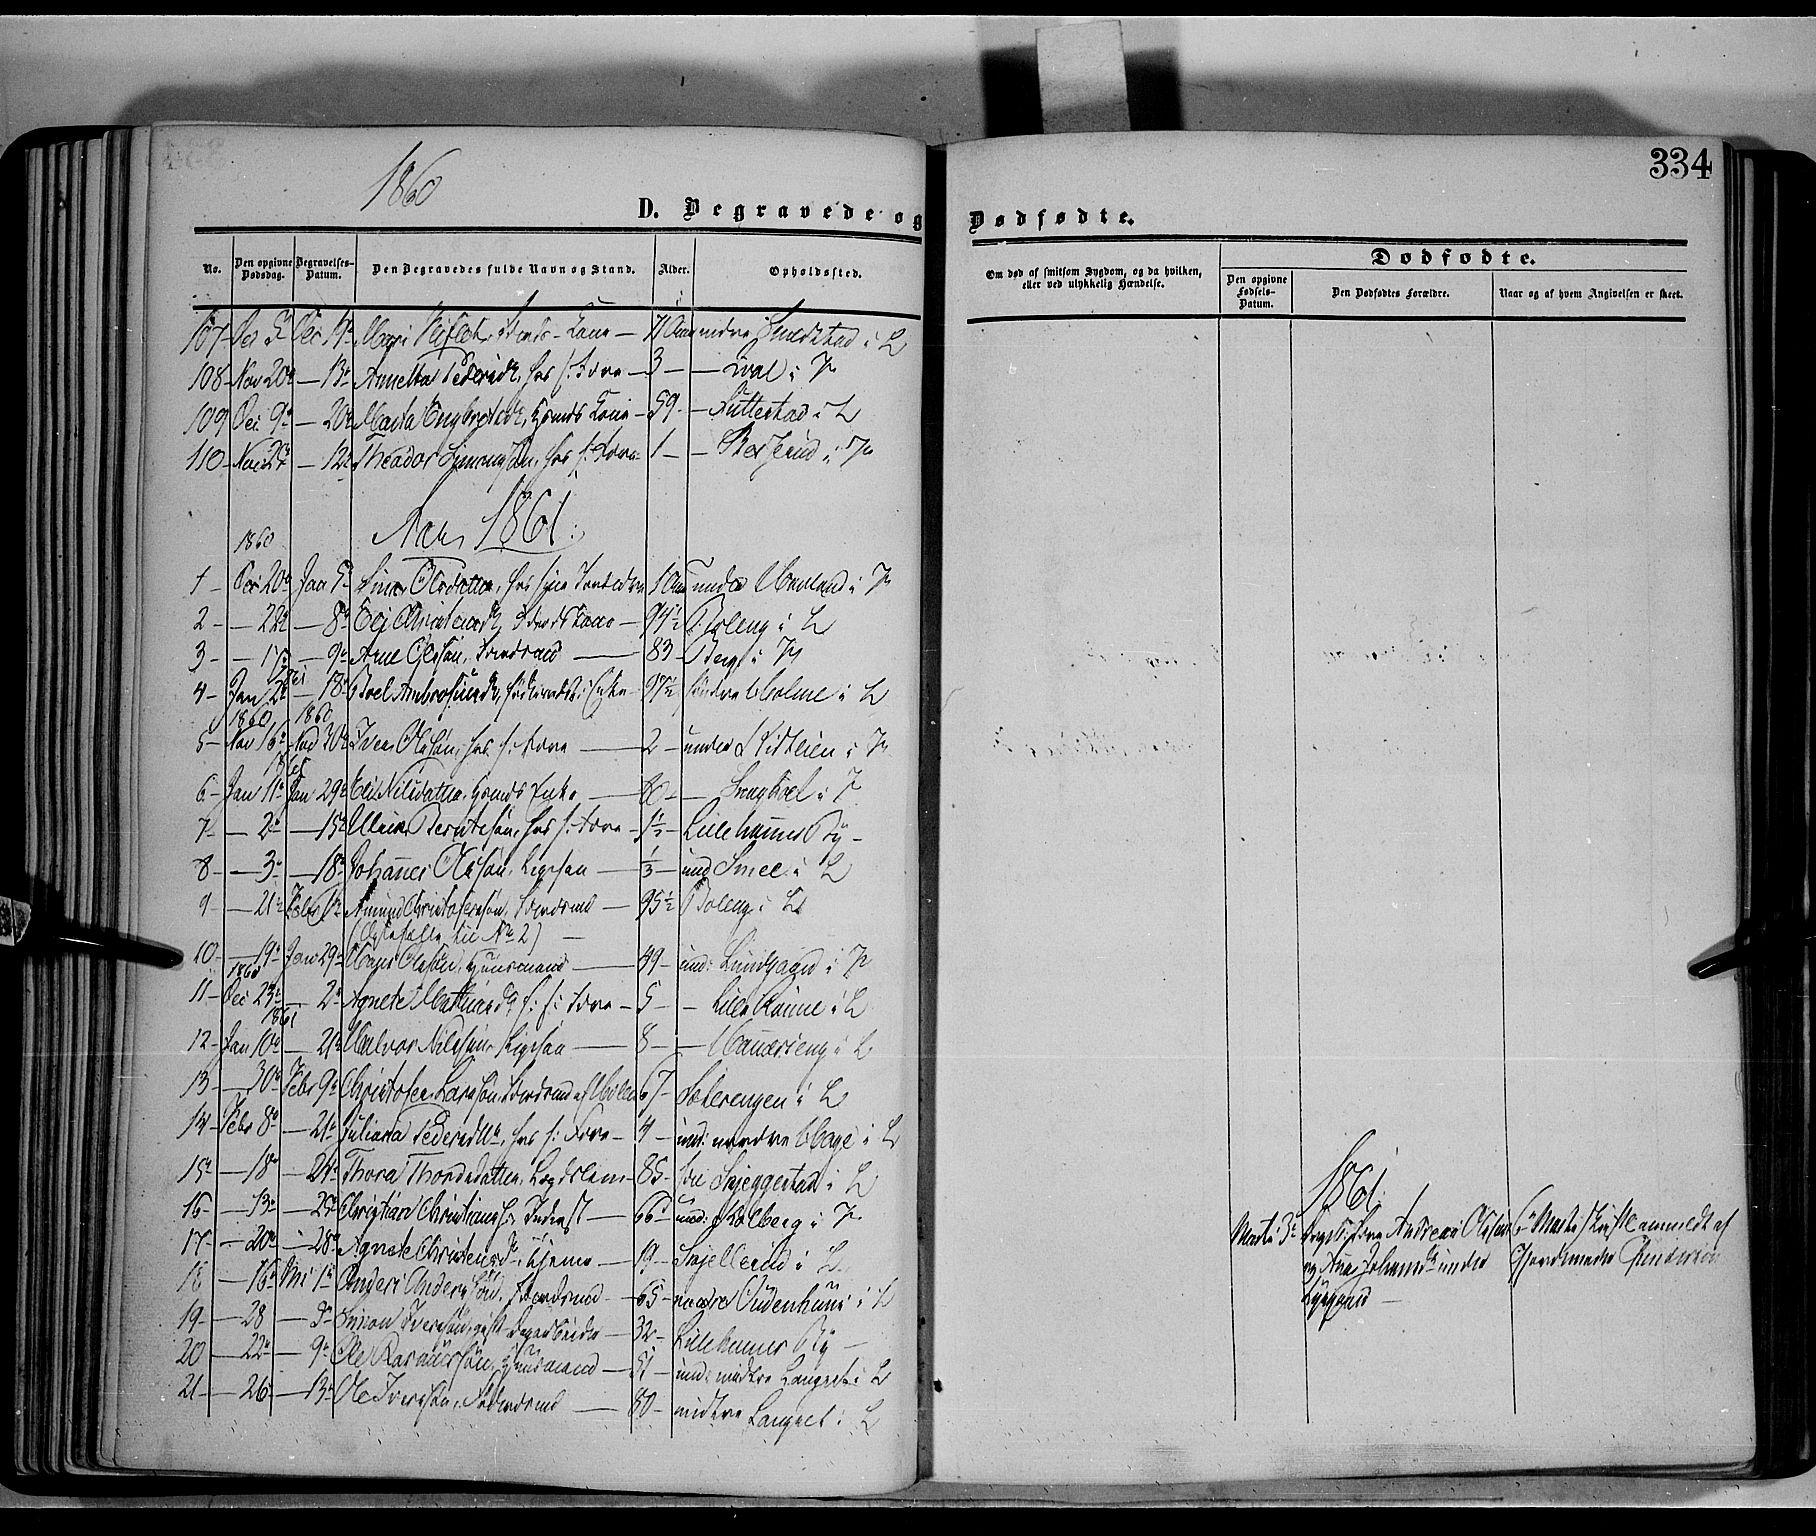 SAH, Fåberg prestekontor, Ministerialbok nr. 6B, 1855-1867, s. 334